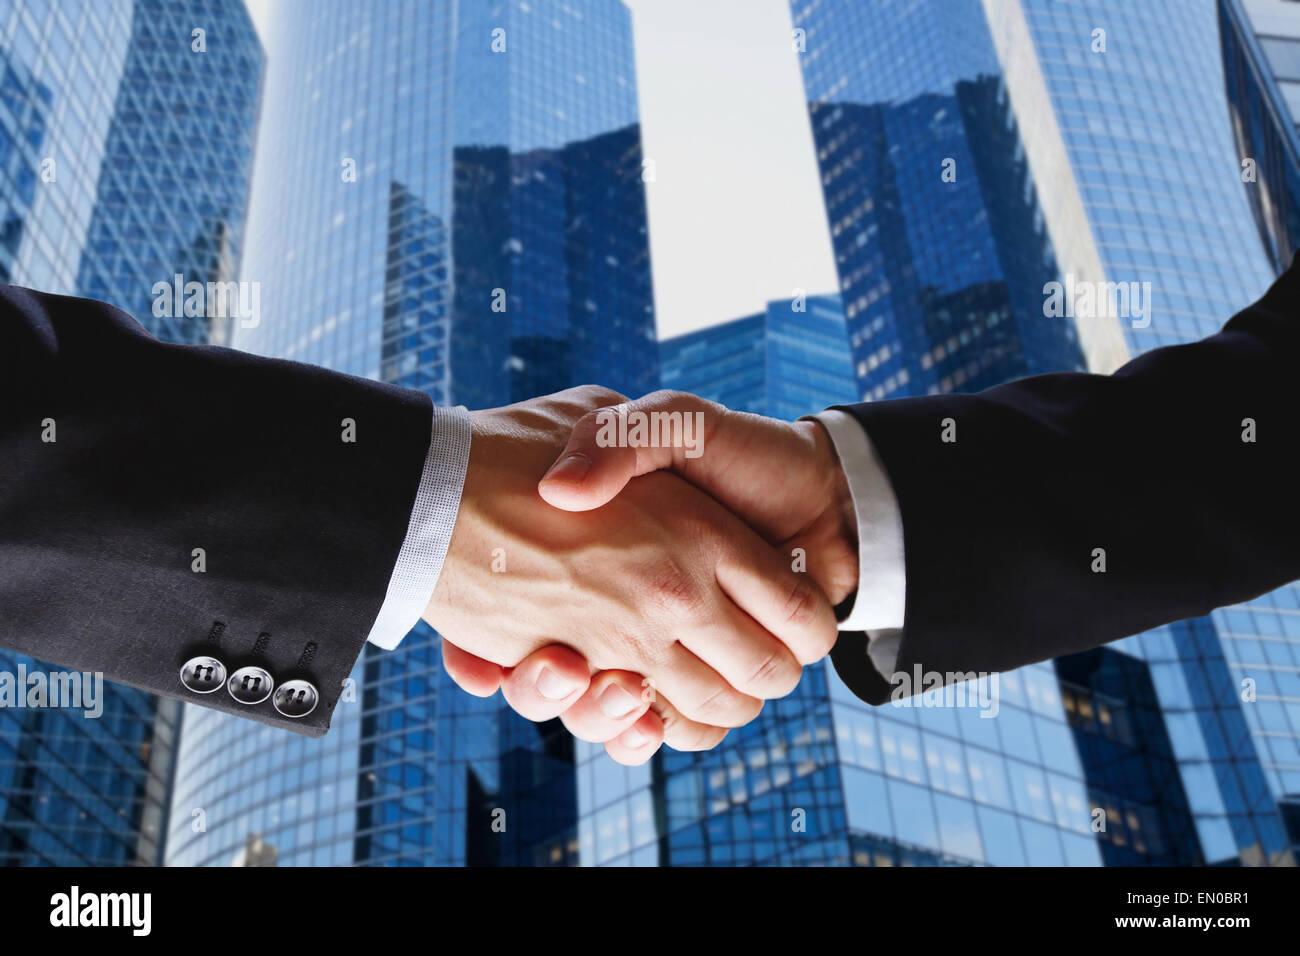 business deal, handshake on modern blue background - Stock Image